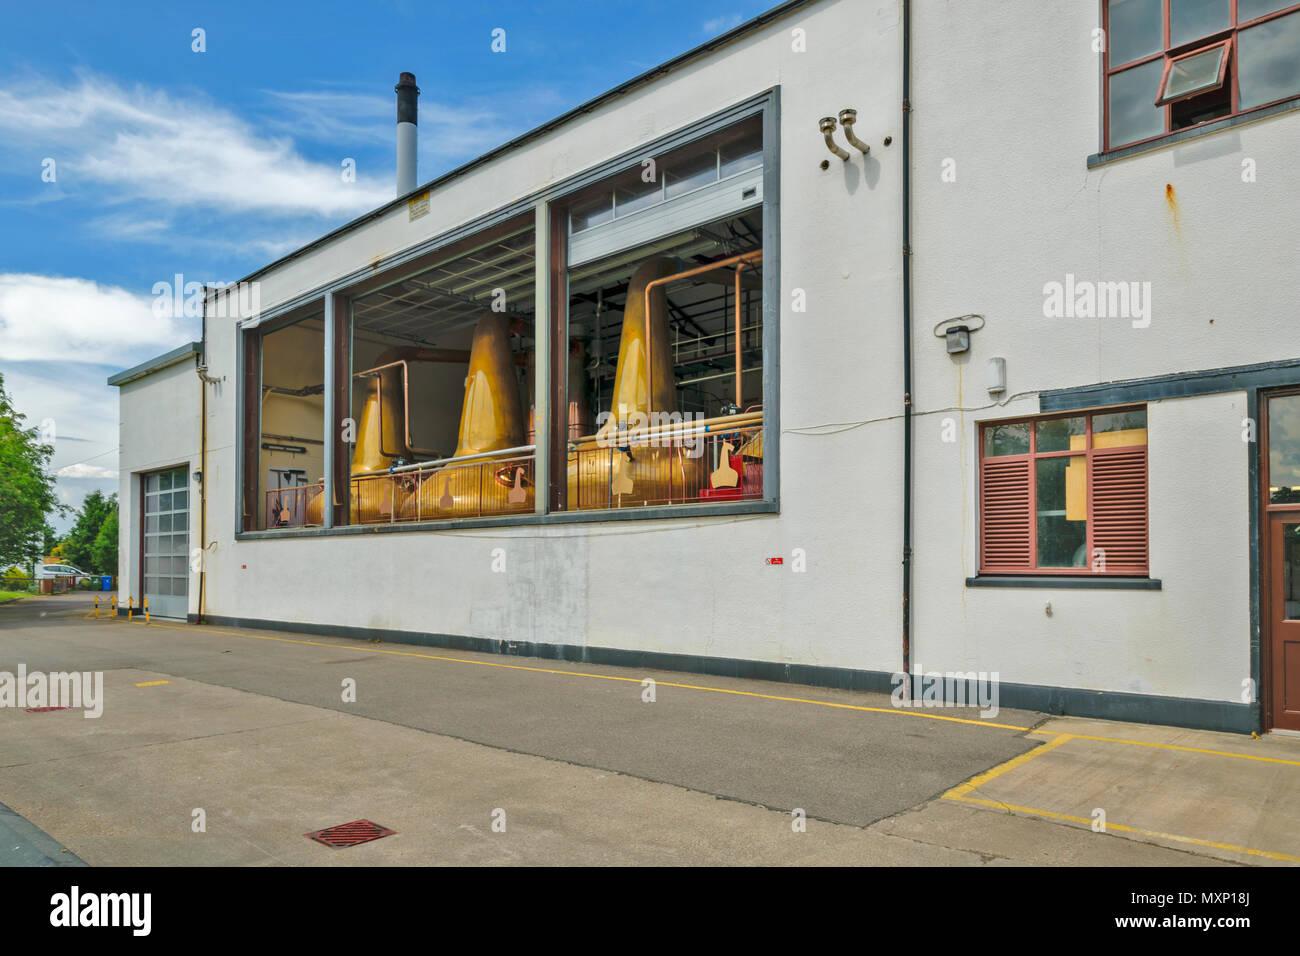 ROYAL BRACKLA WHISKY DISTILLERY CAWDOR ESTATE NAIRN SCOTLAND MAIN DISTILLERY BUILDINGS WTH STILLS - Stock Image